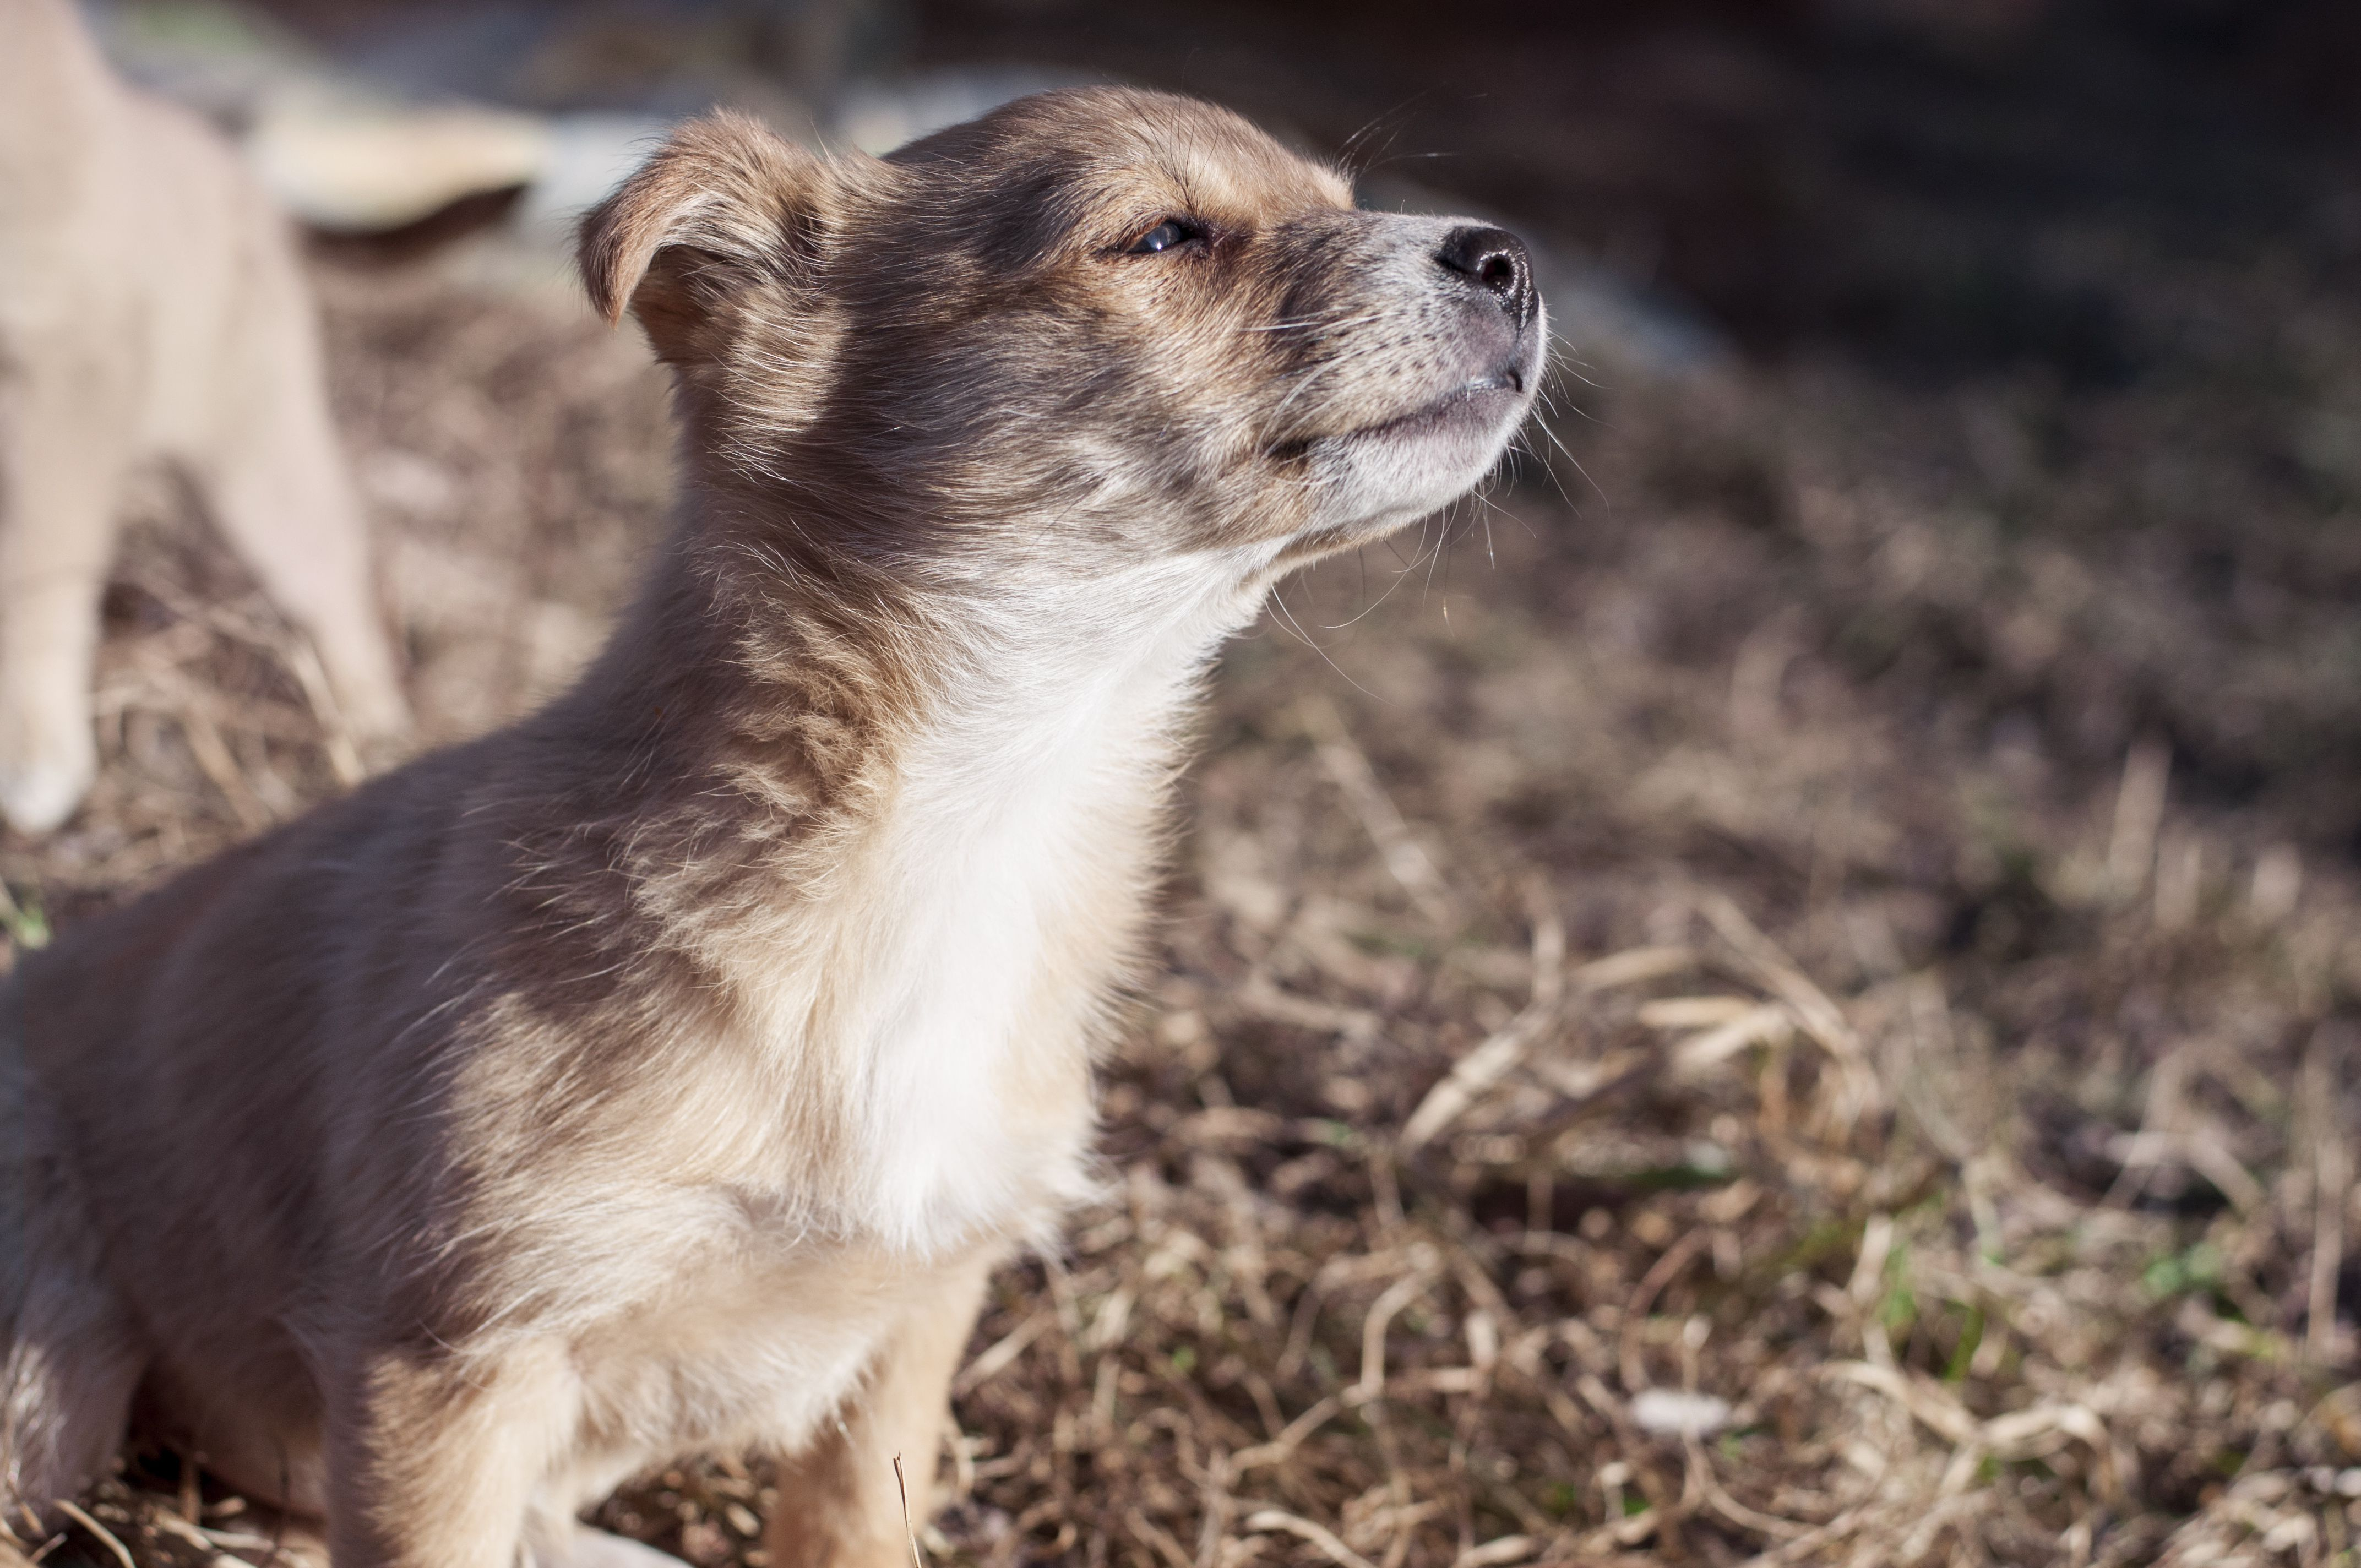 Small dog basking in sunlight